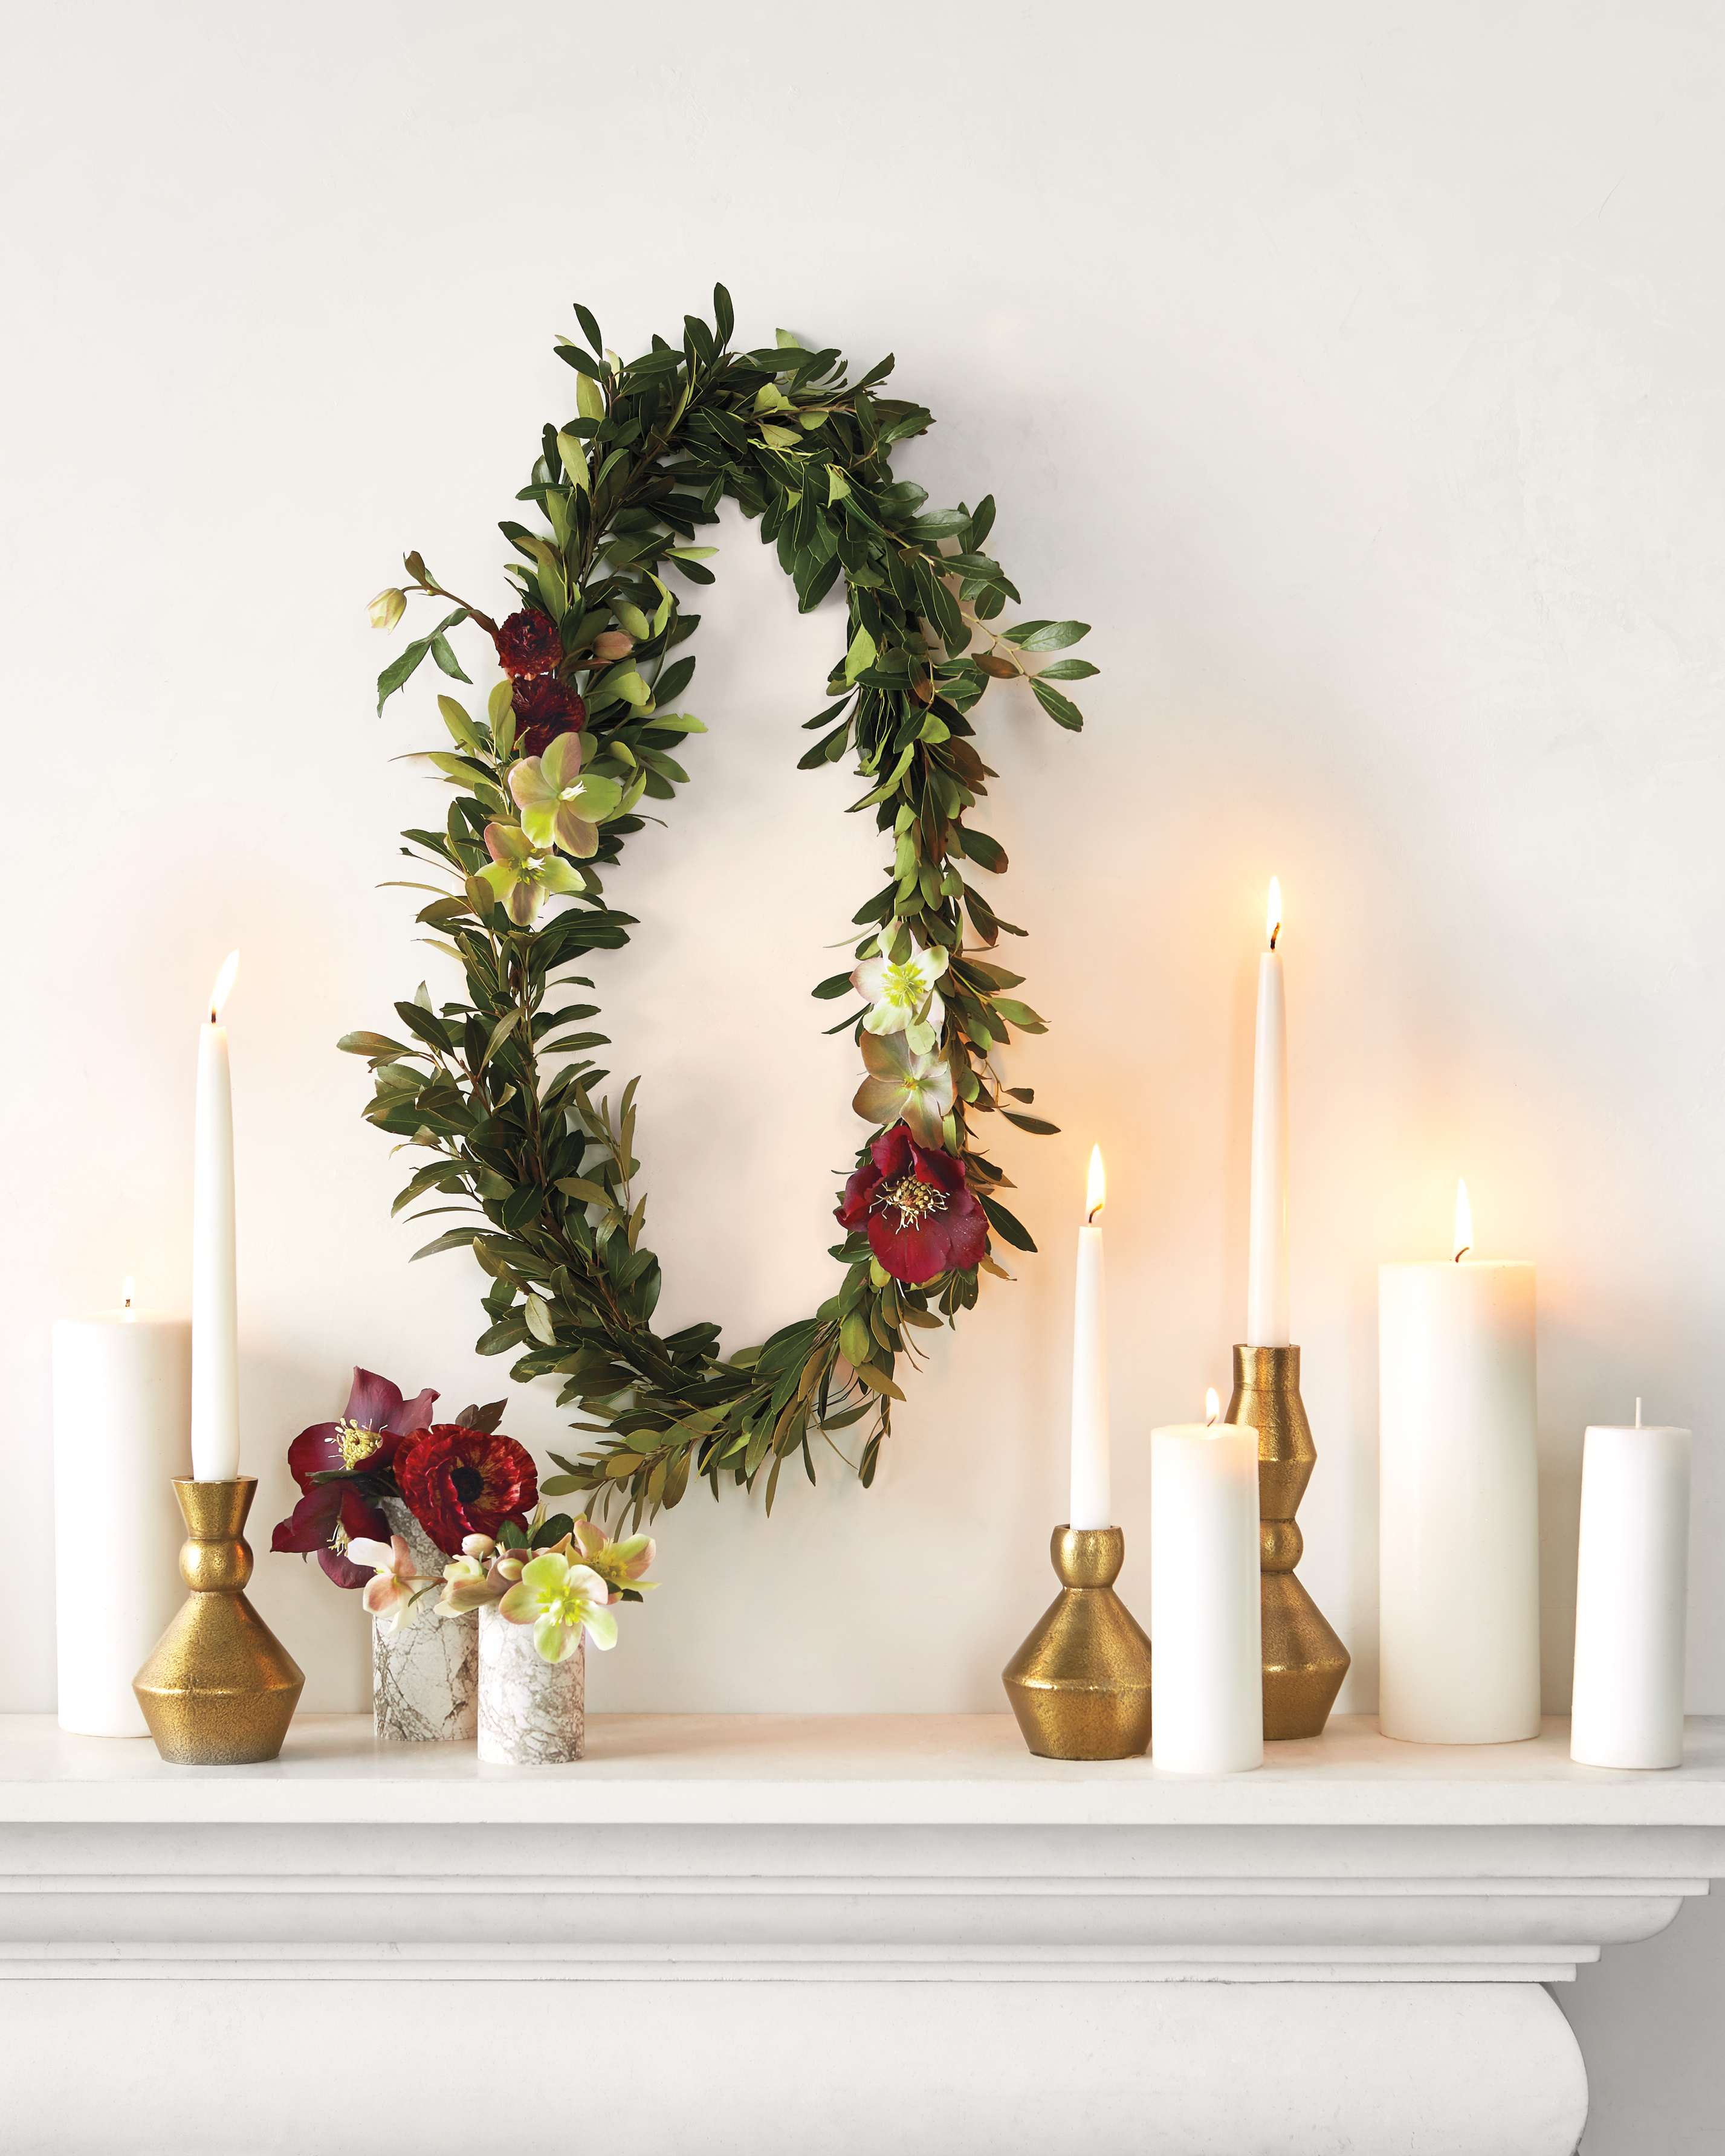 opener-wreath-mantle-02-d111996.jpg